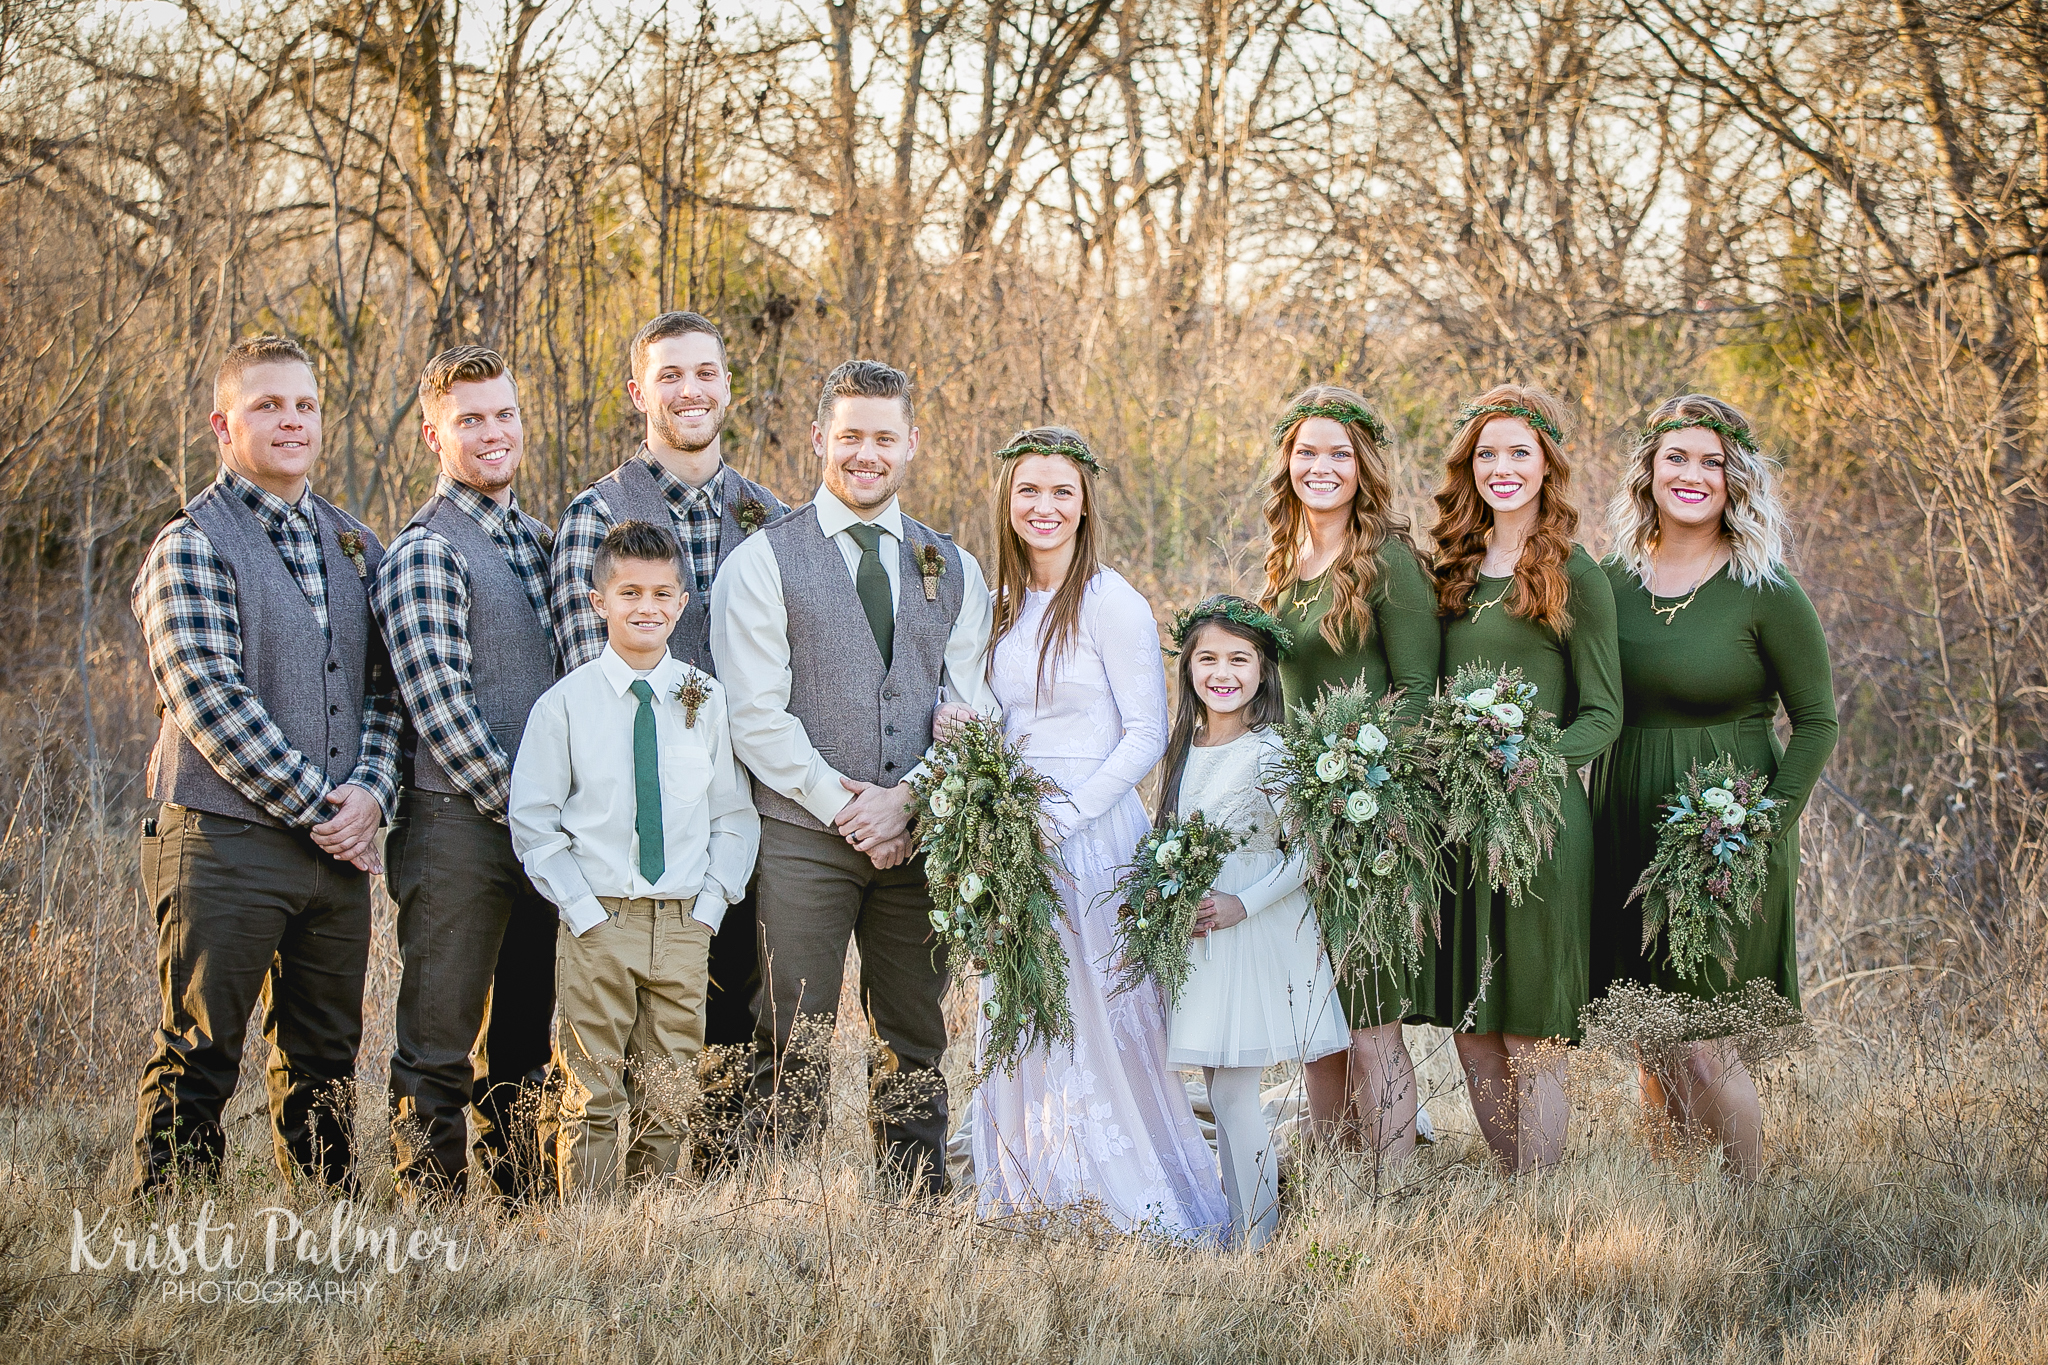 tulsa bridal party bride groom bridesmaids groomsmen flower girl ring bearer